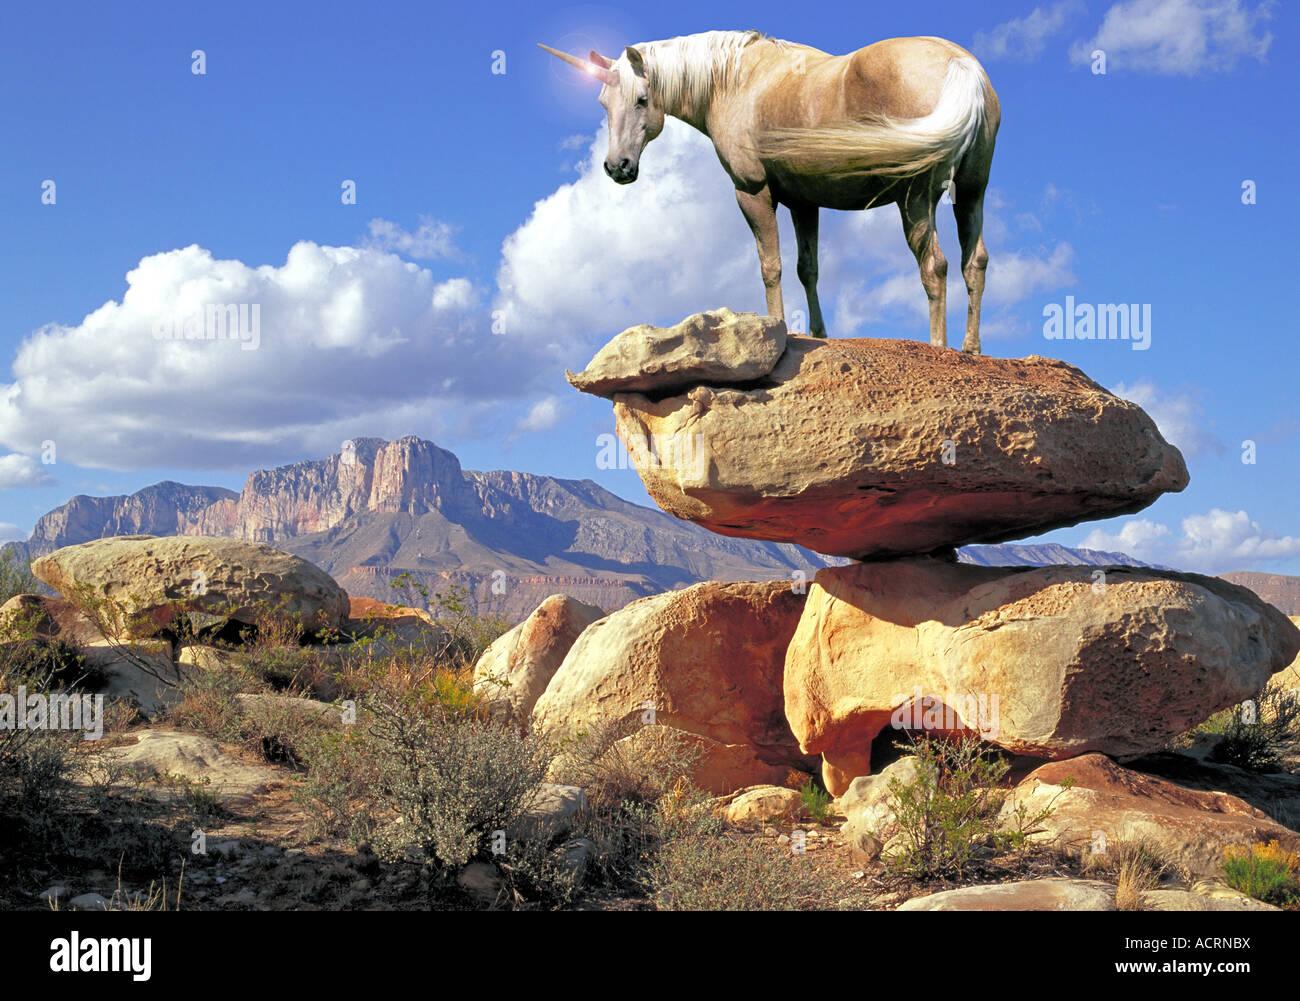 Spiral horned Unicorn - Stock Image